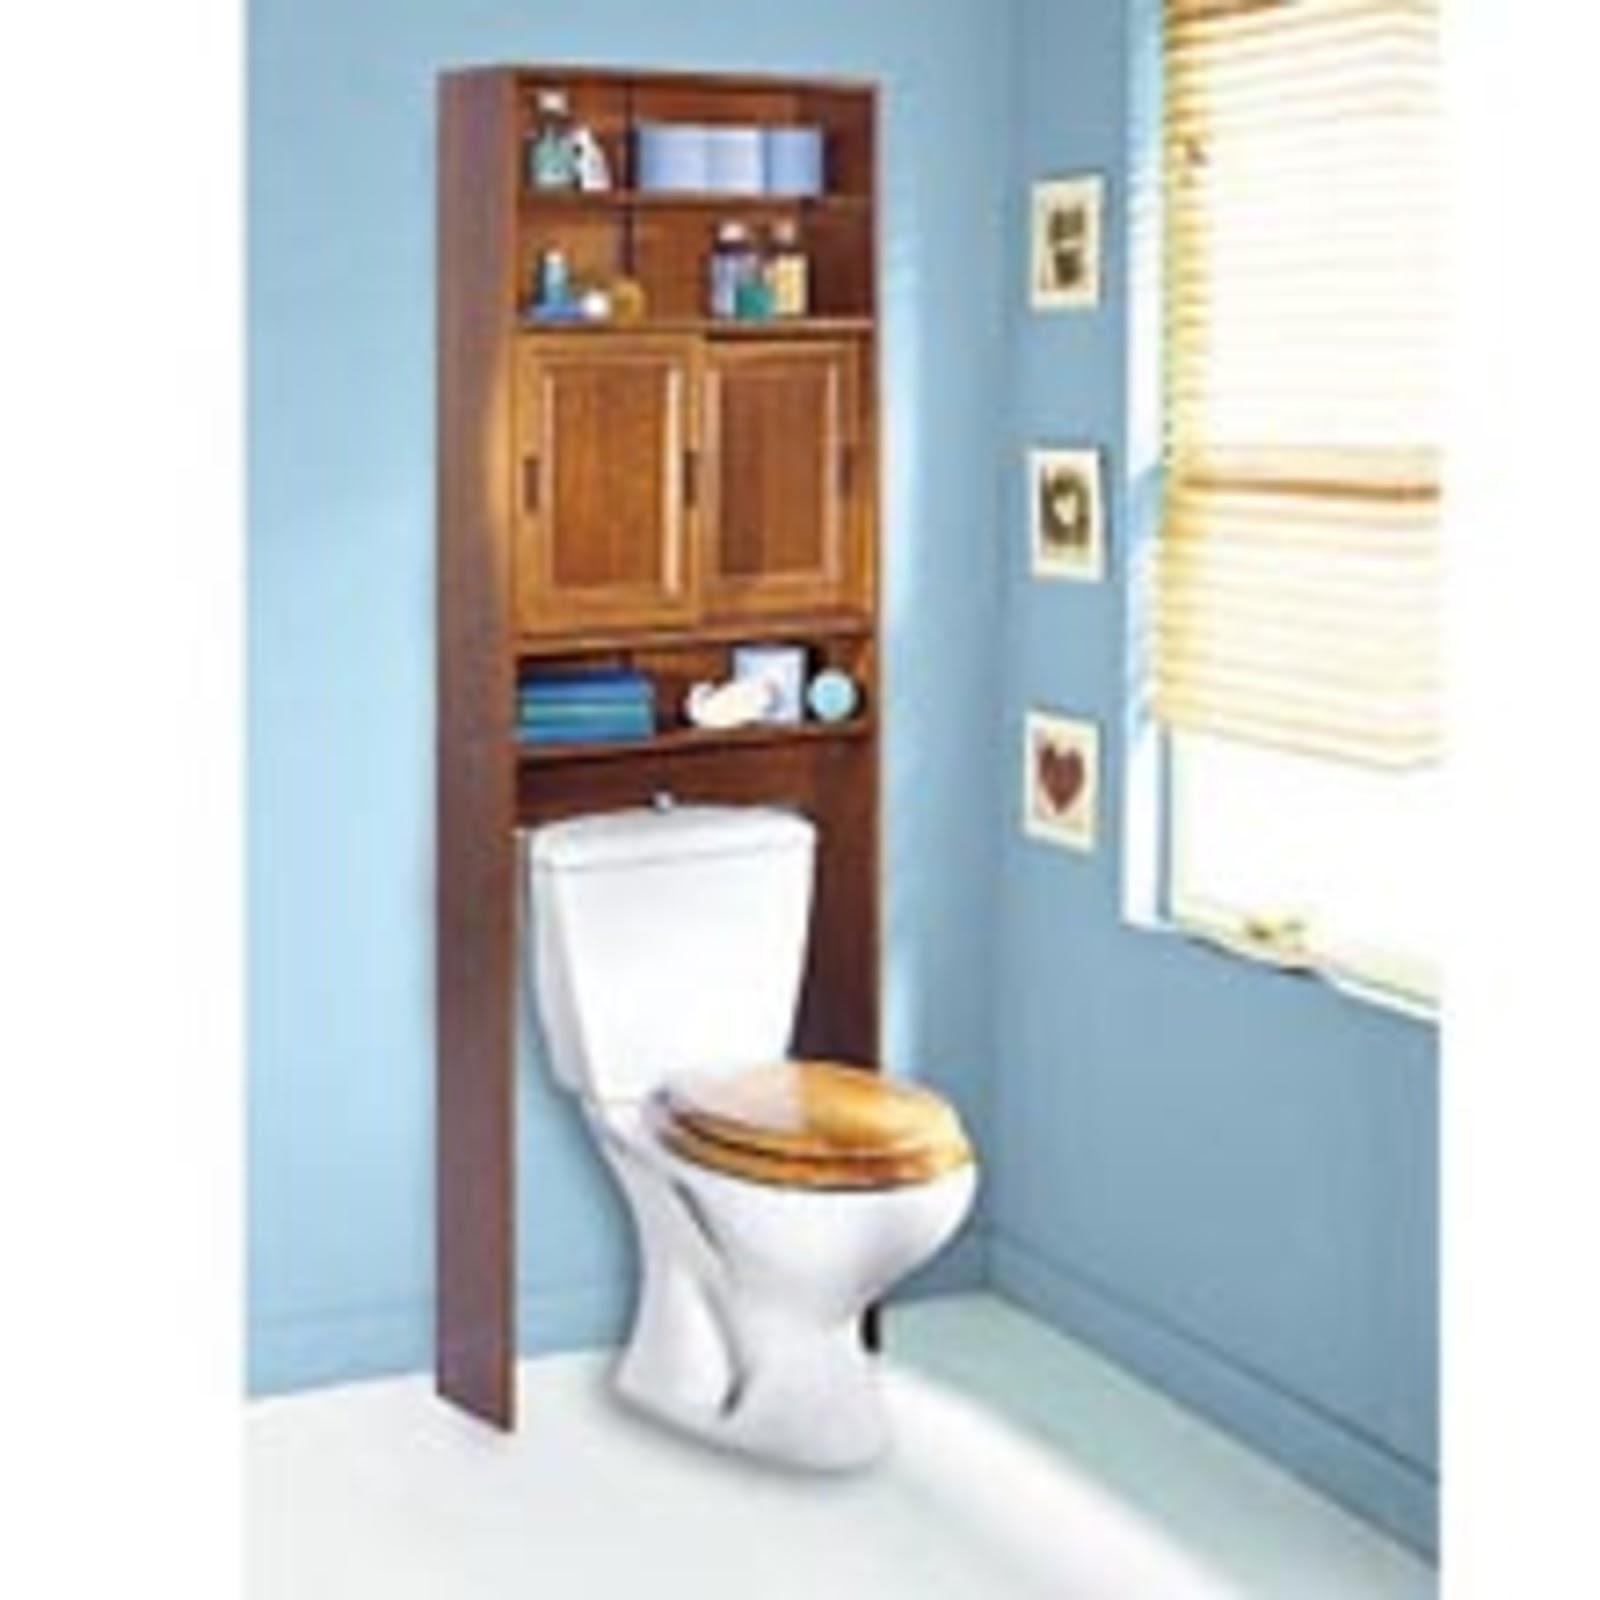 #997832 Indogate.com Meuble Rangement Salle De Bain Alinea 2651 petite salle de bain avec rangement 1600x1600 px @ aertt.com